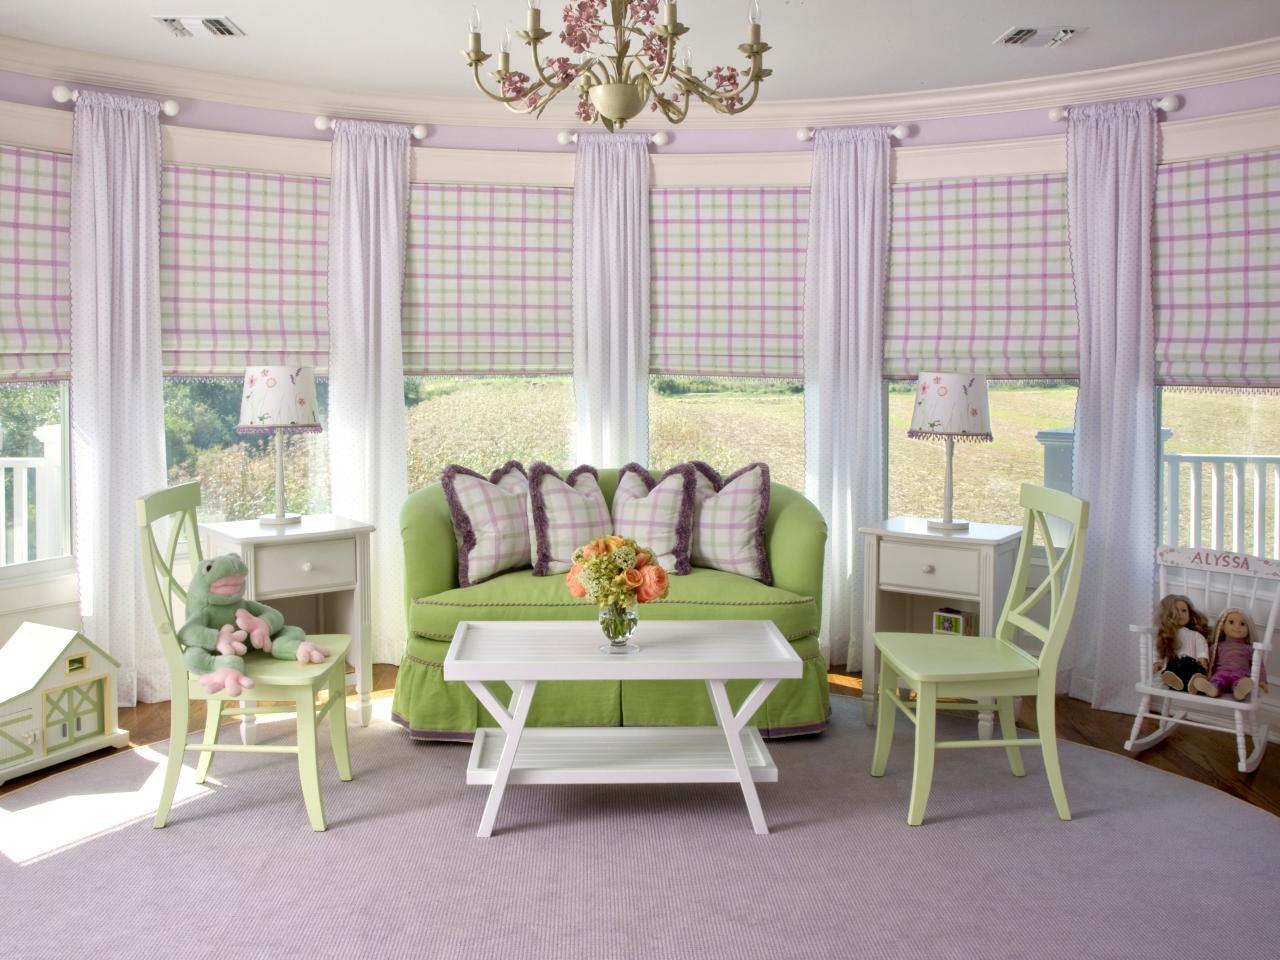 40 Girls\' Bedroom Design Ideas | Alexander Gruenewald